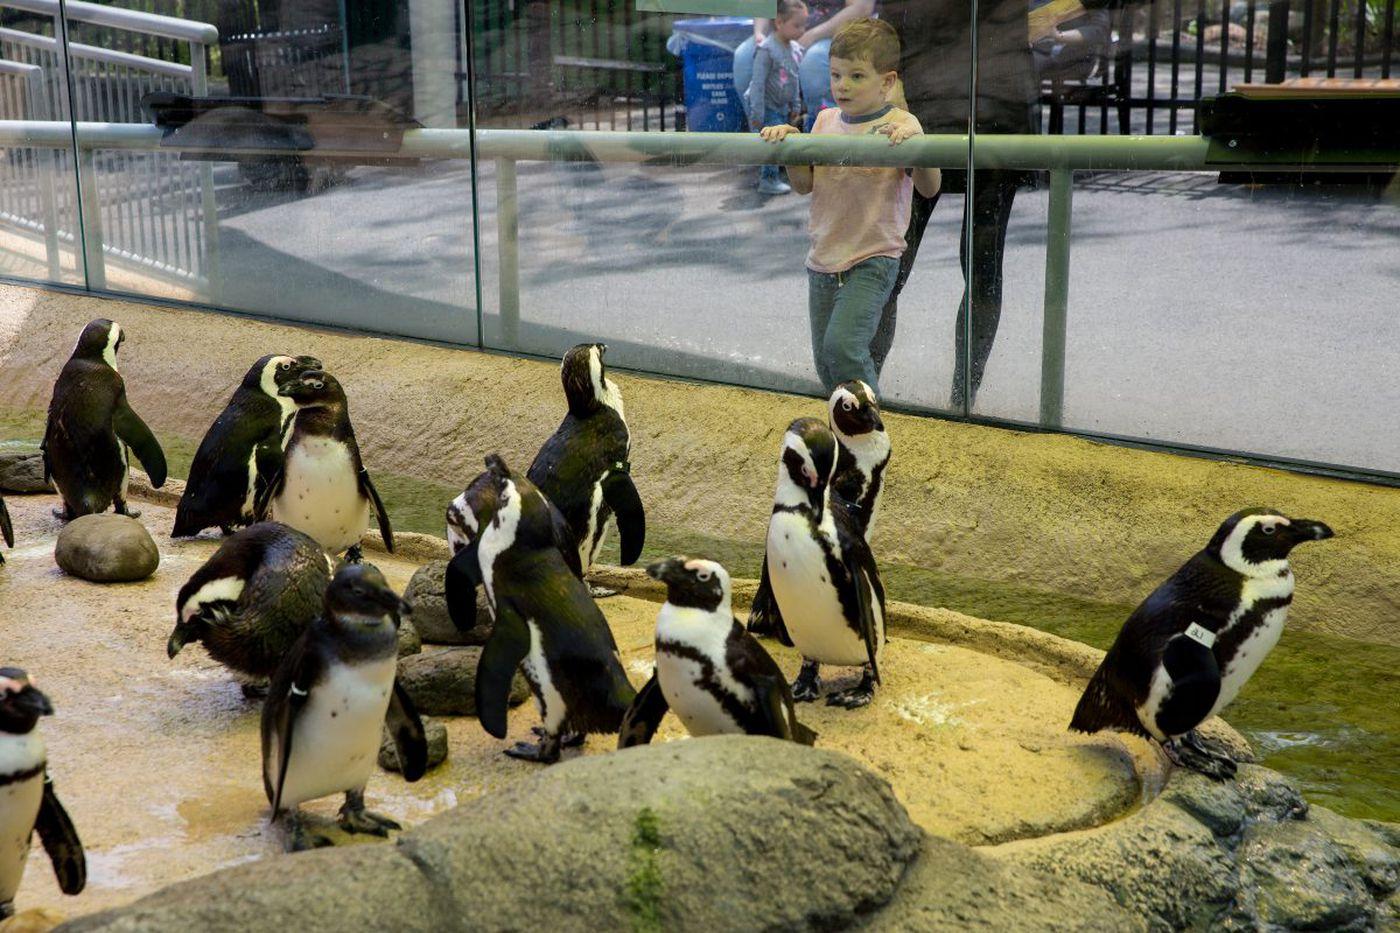 Endangered penguins splash it up in new digs at Camden's Adventure Aquarium